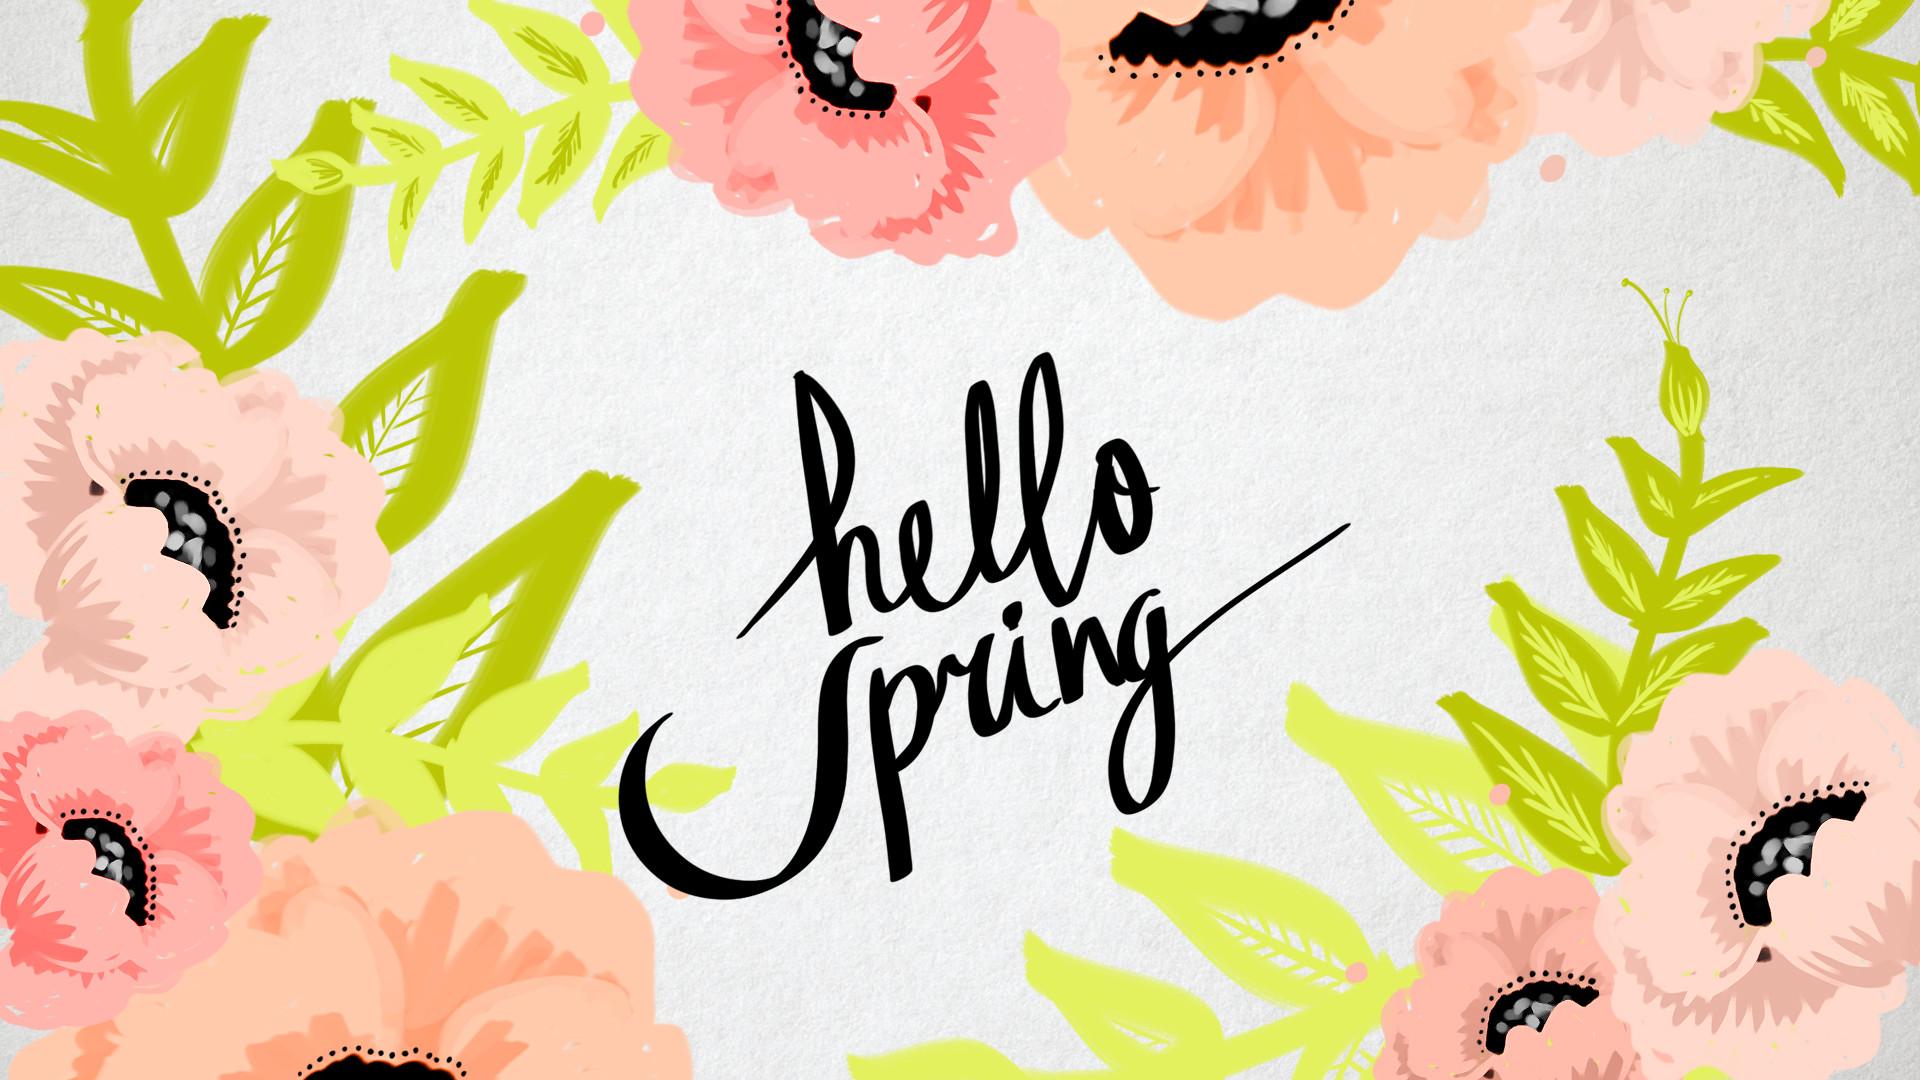 30 Cute Spring Wallpaper   Basty Wallpaper 1920x1080